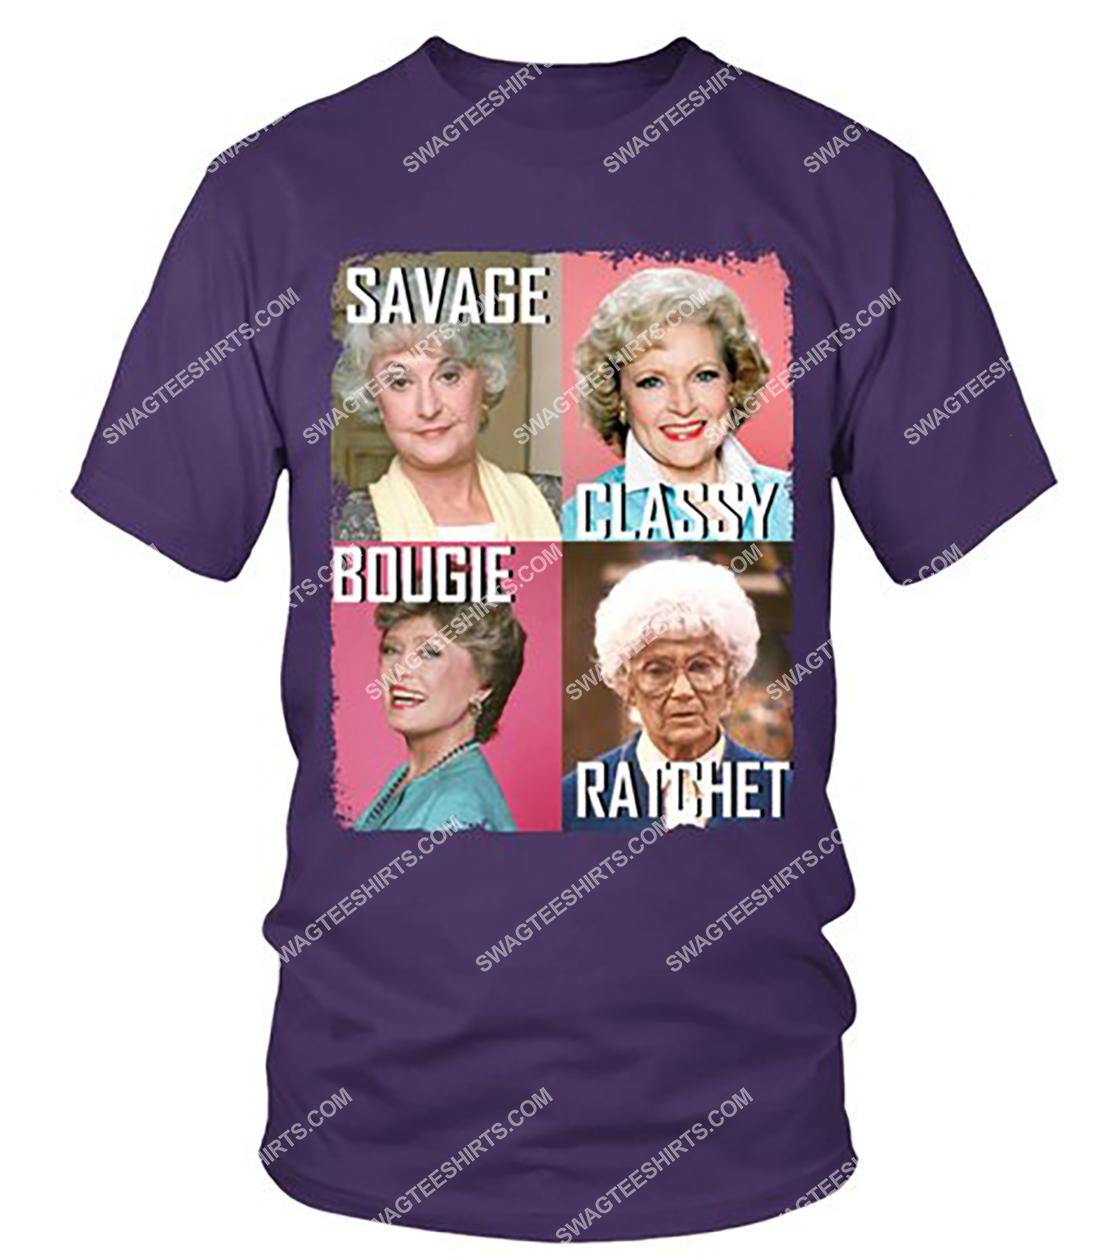 savage classy bougie ratchet the golden girls movie shirt 2(1)